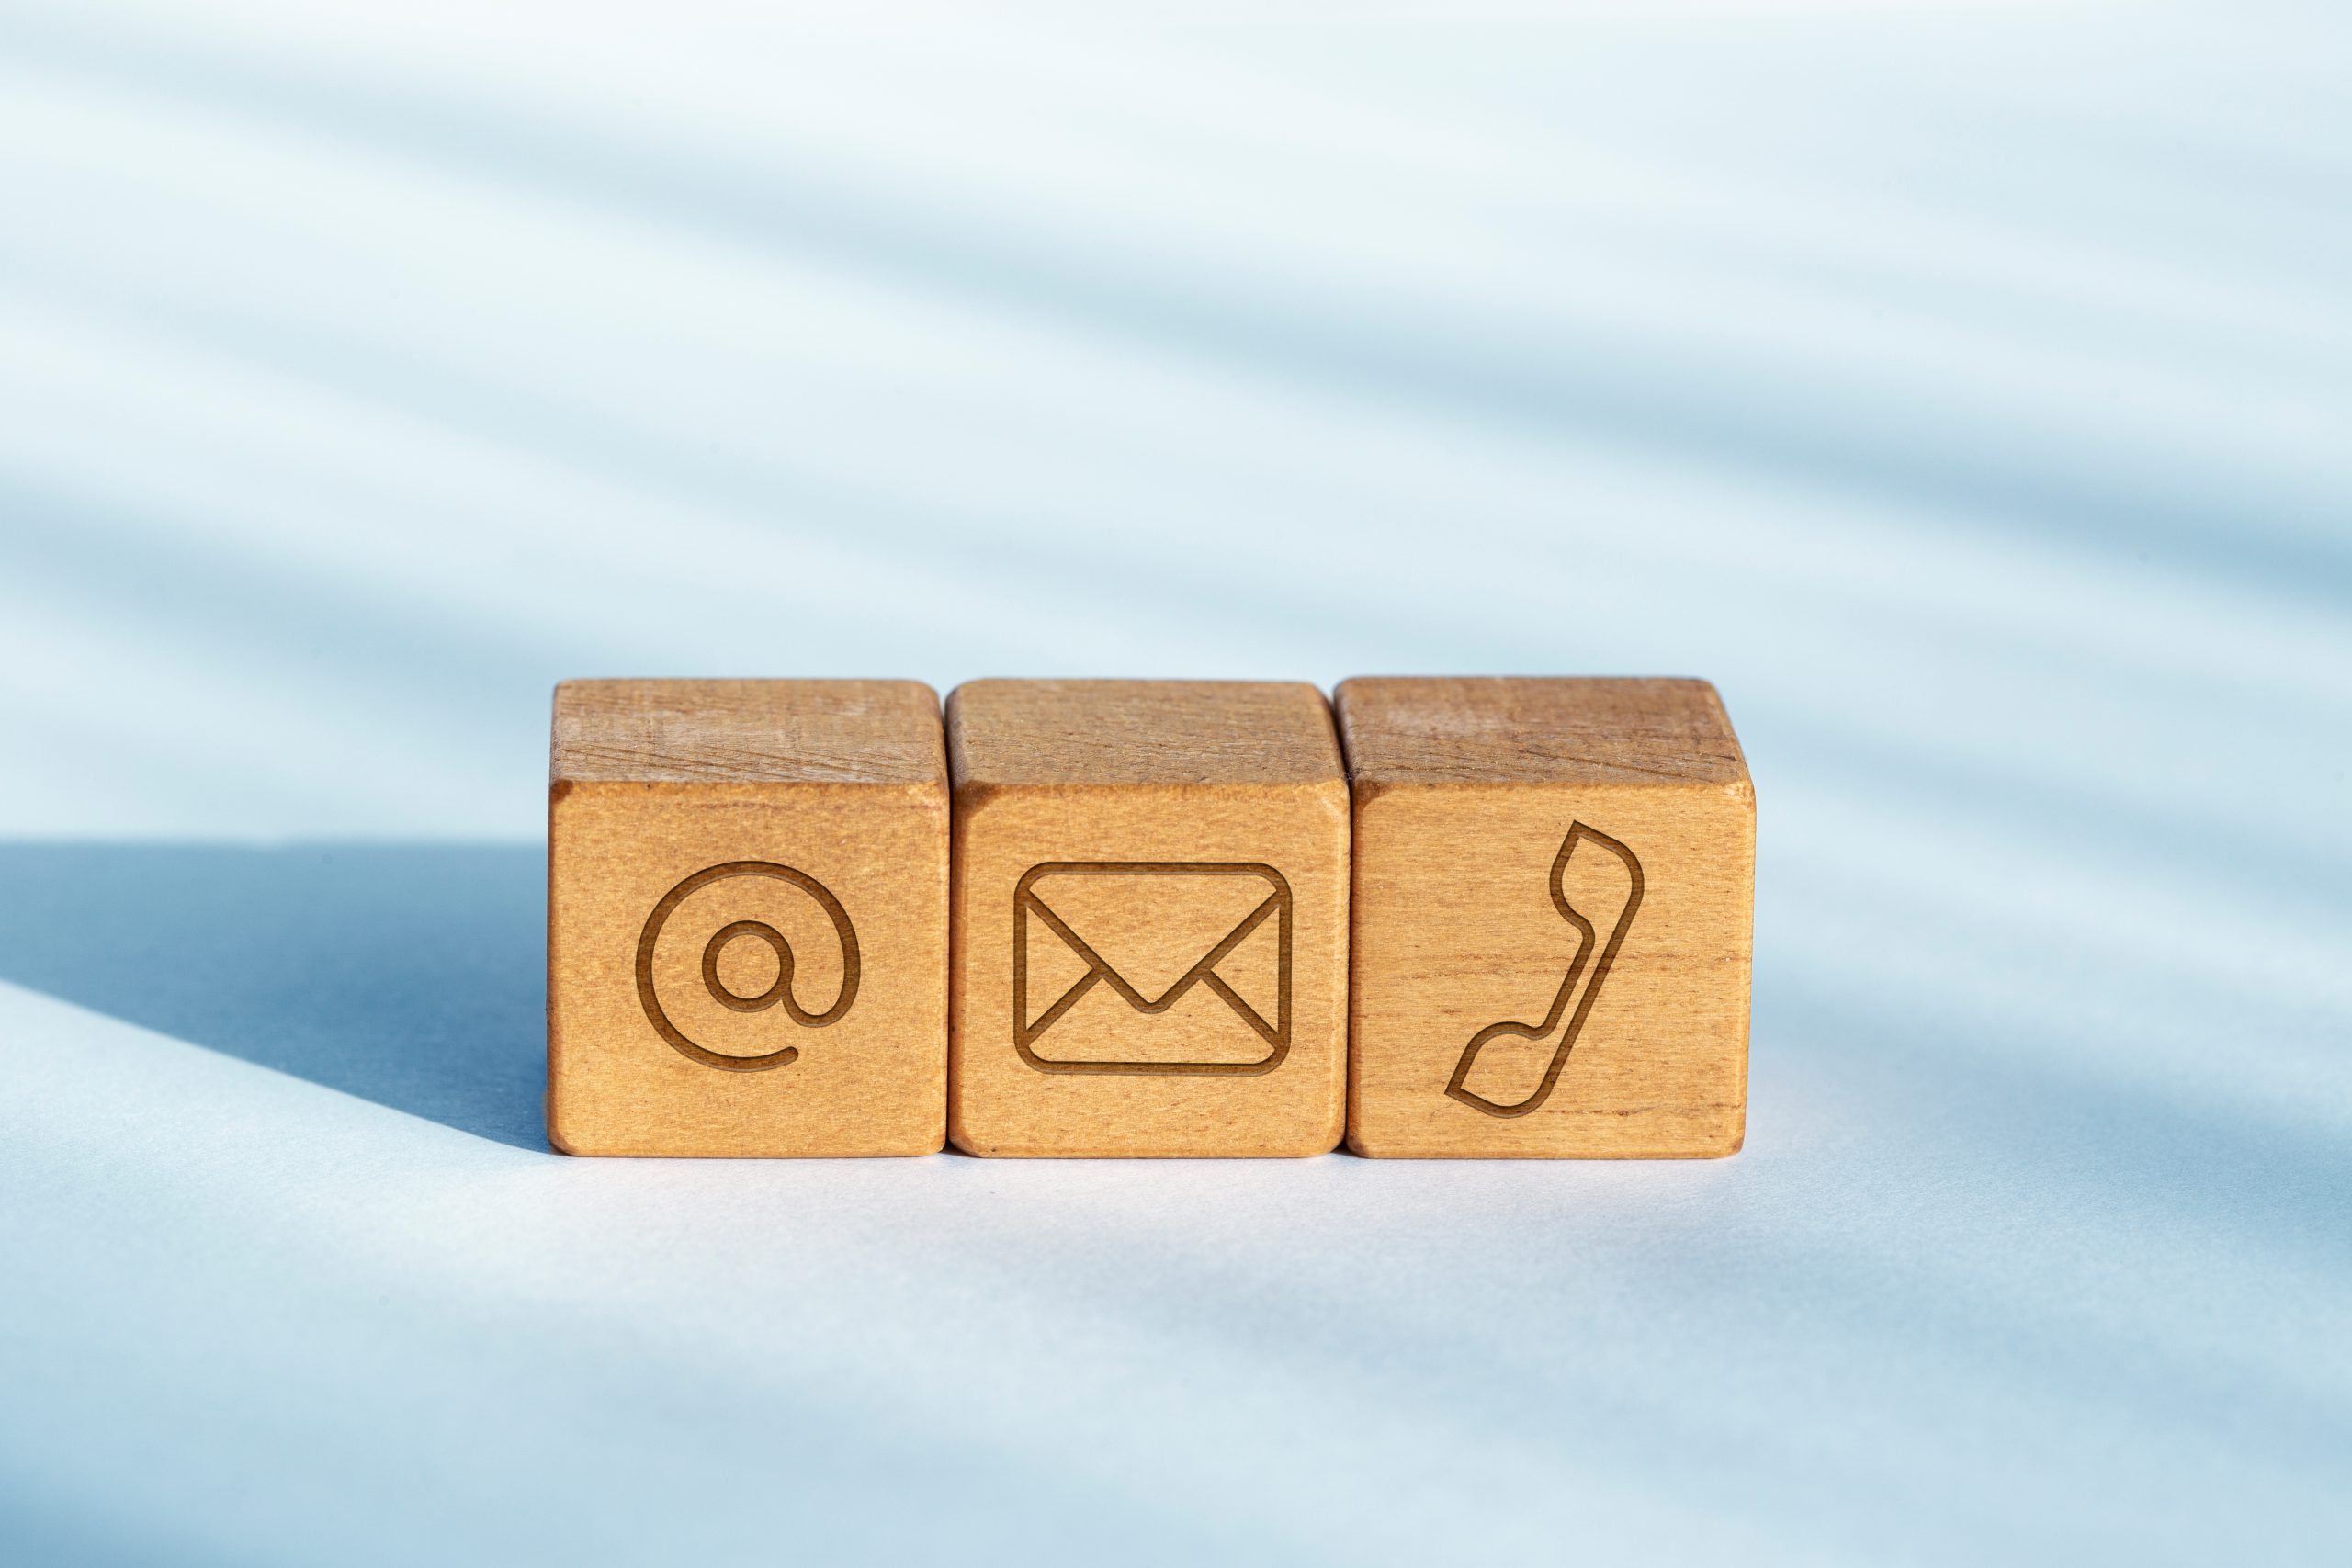 blocks with symbols